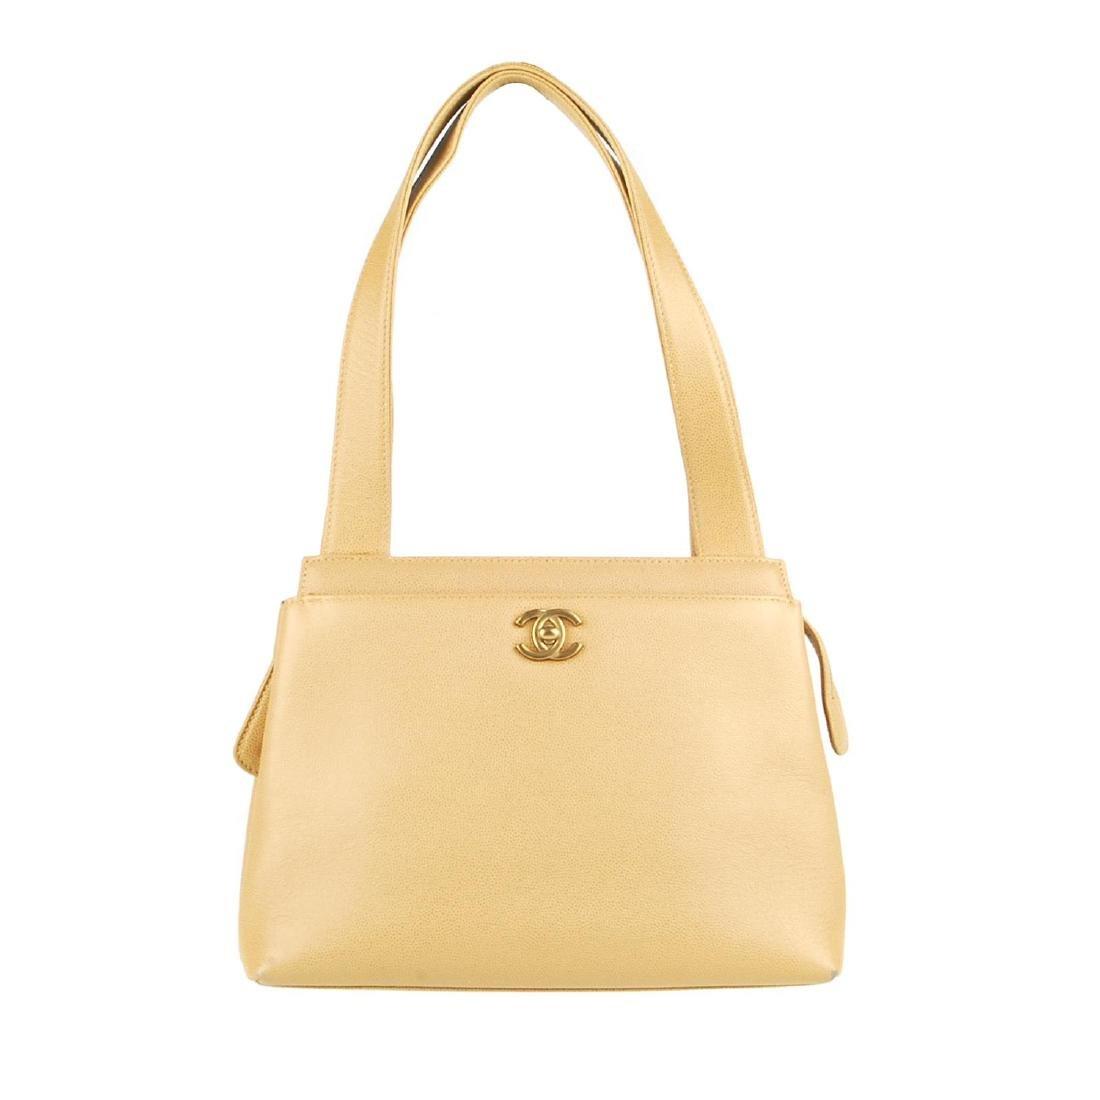 CHANEL - a late 90s small beige Caviar leather handbag.